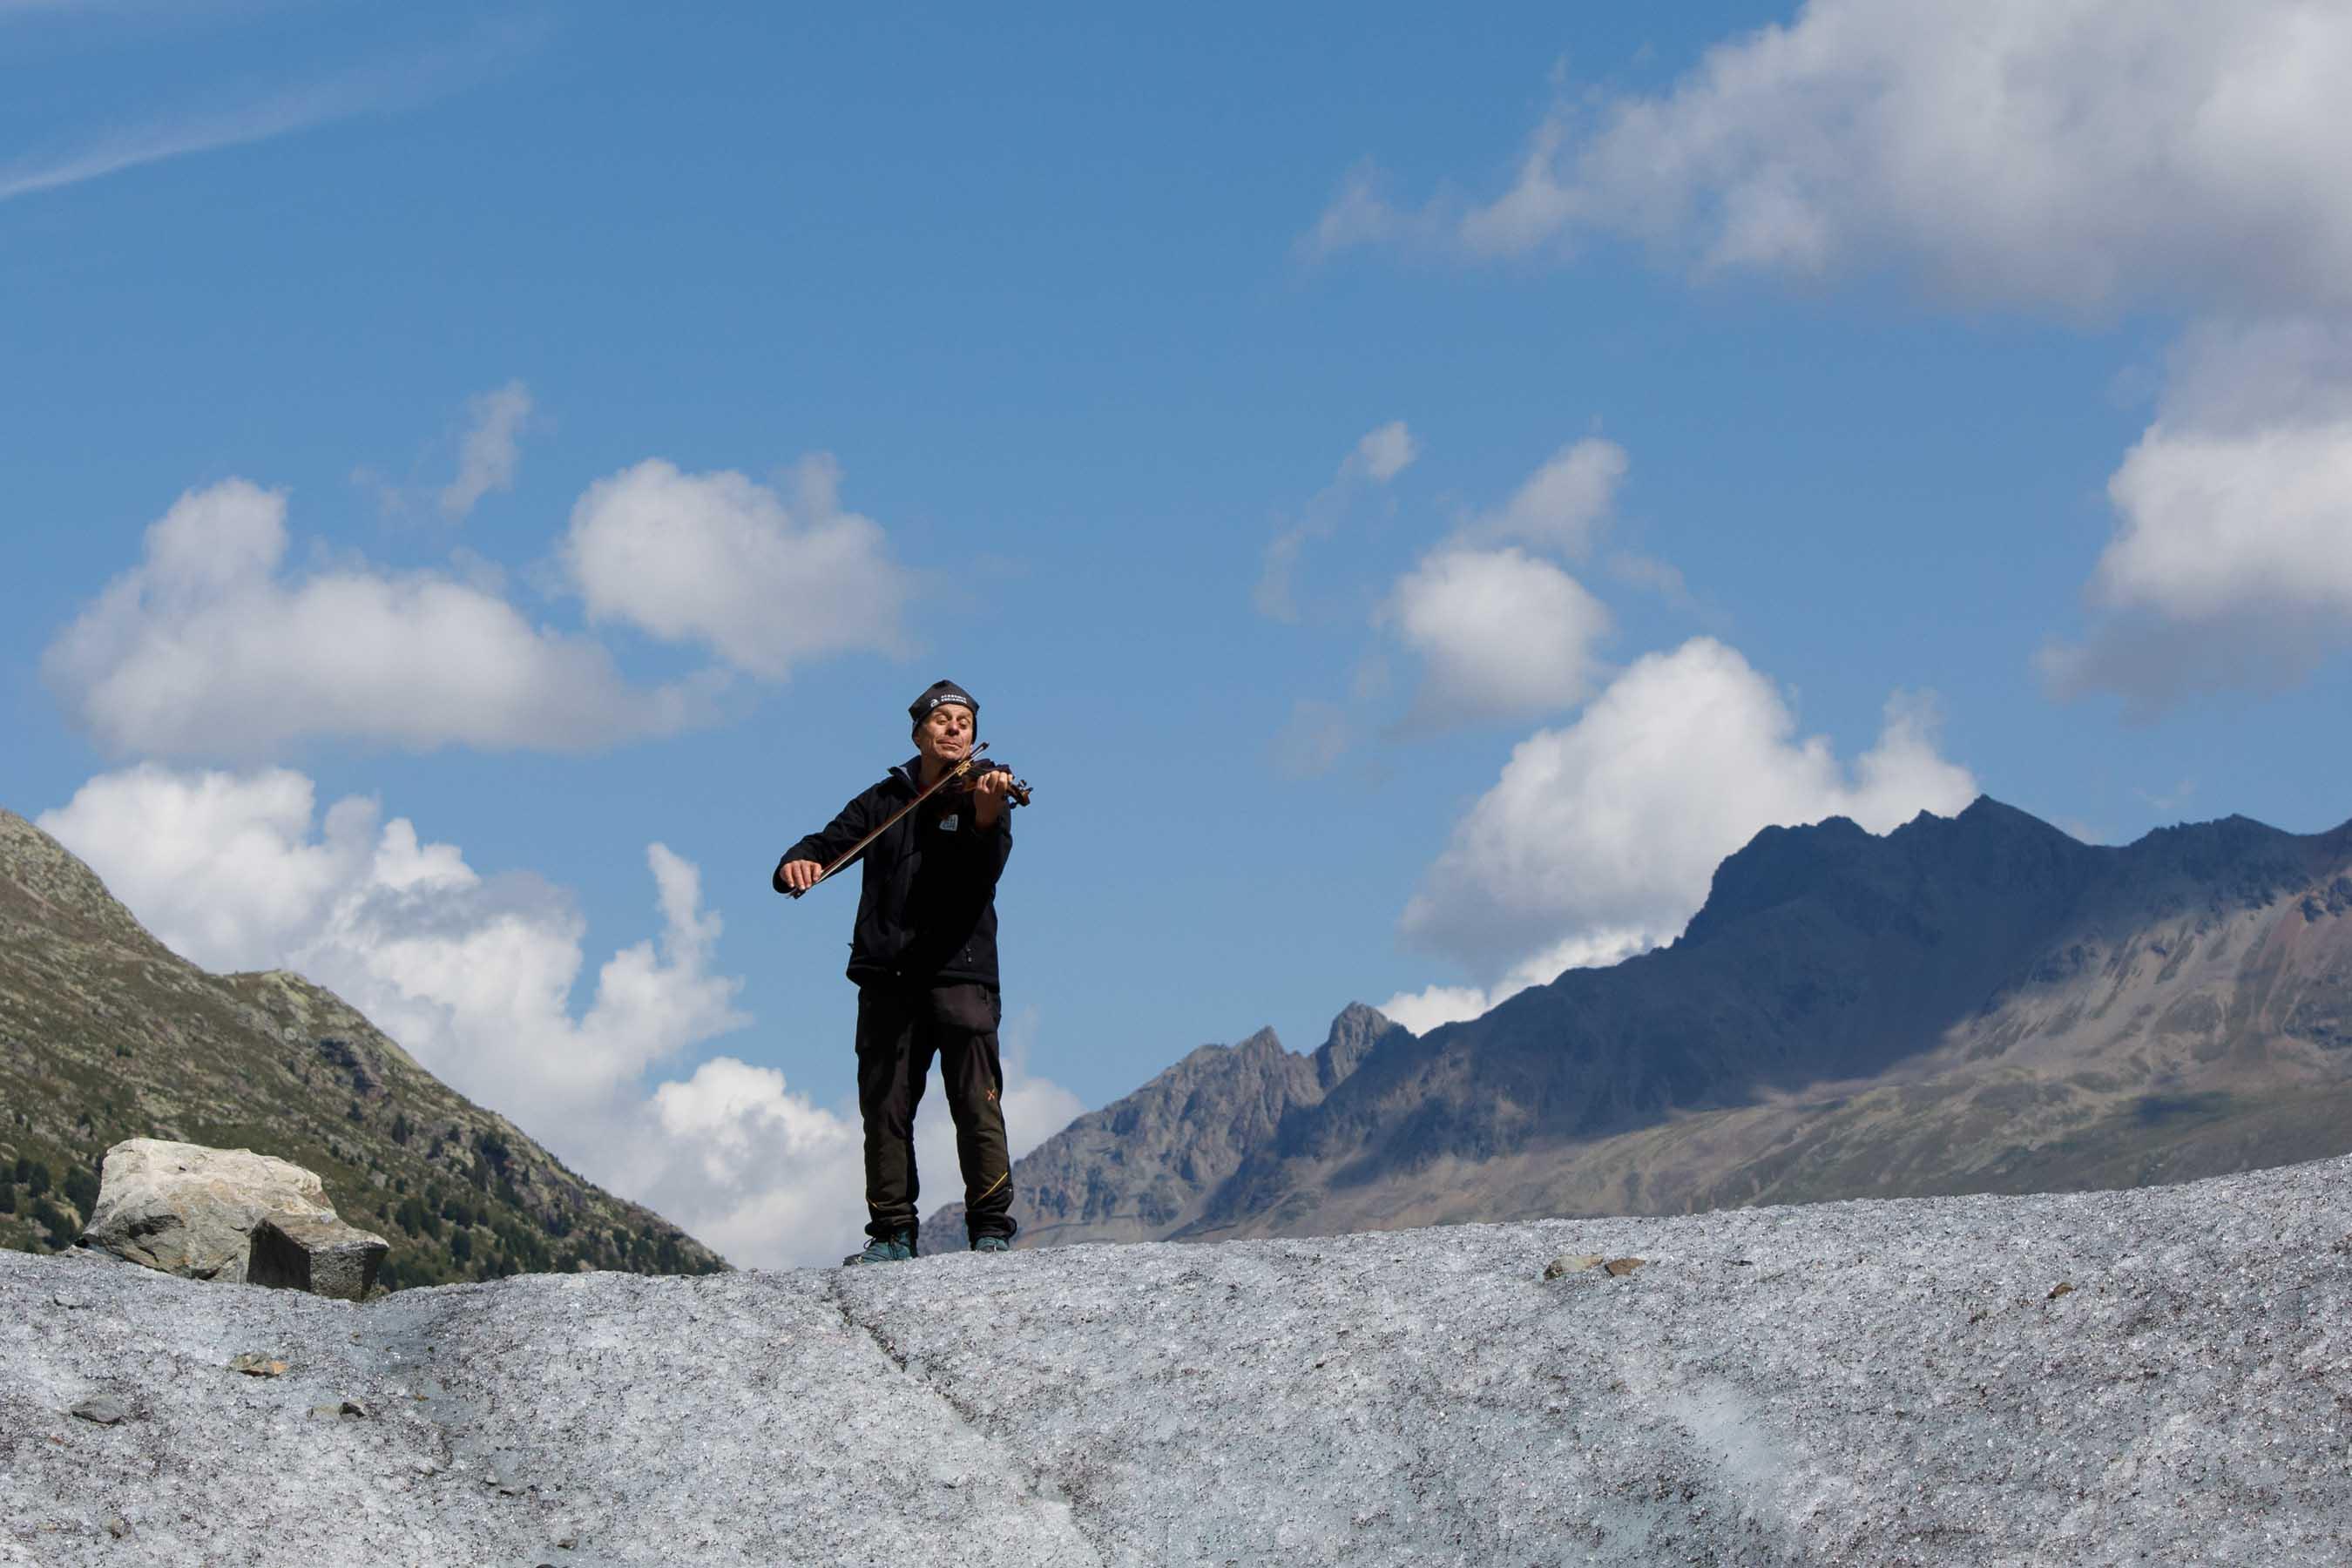 Felix Keller playing the violin at the Morteratsch glacier